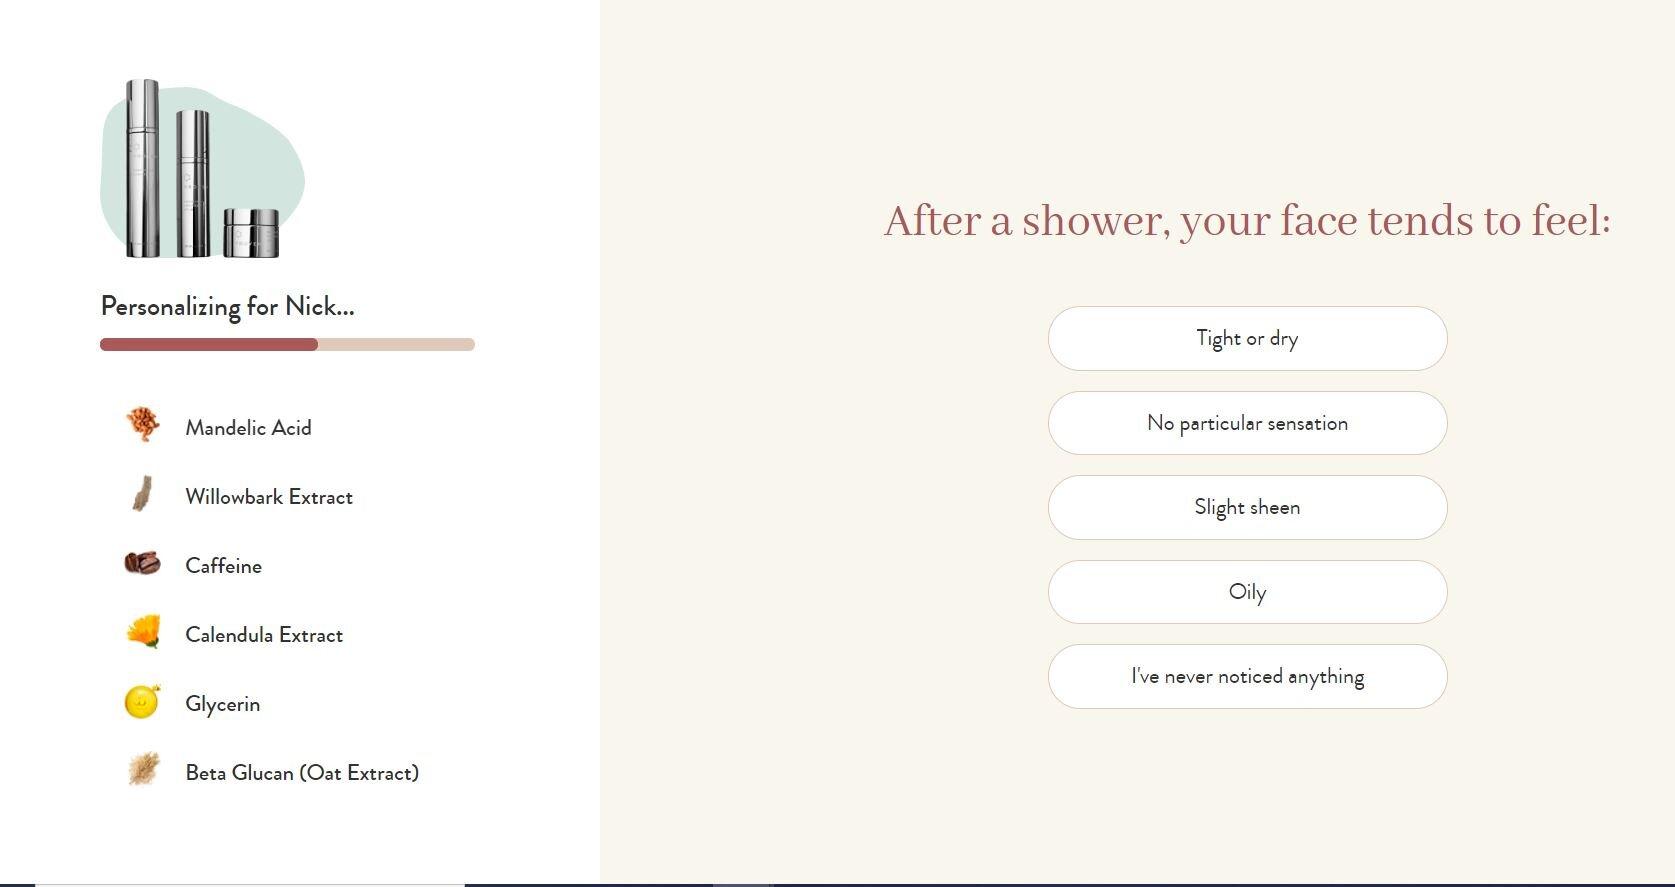 Proven-Skincare-11.JPG